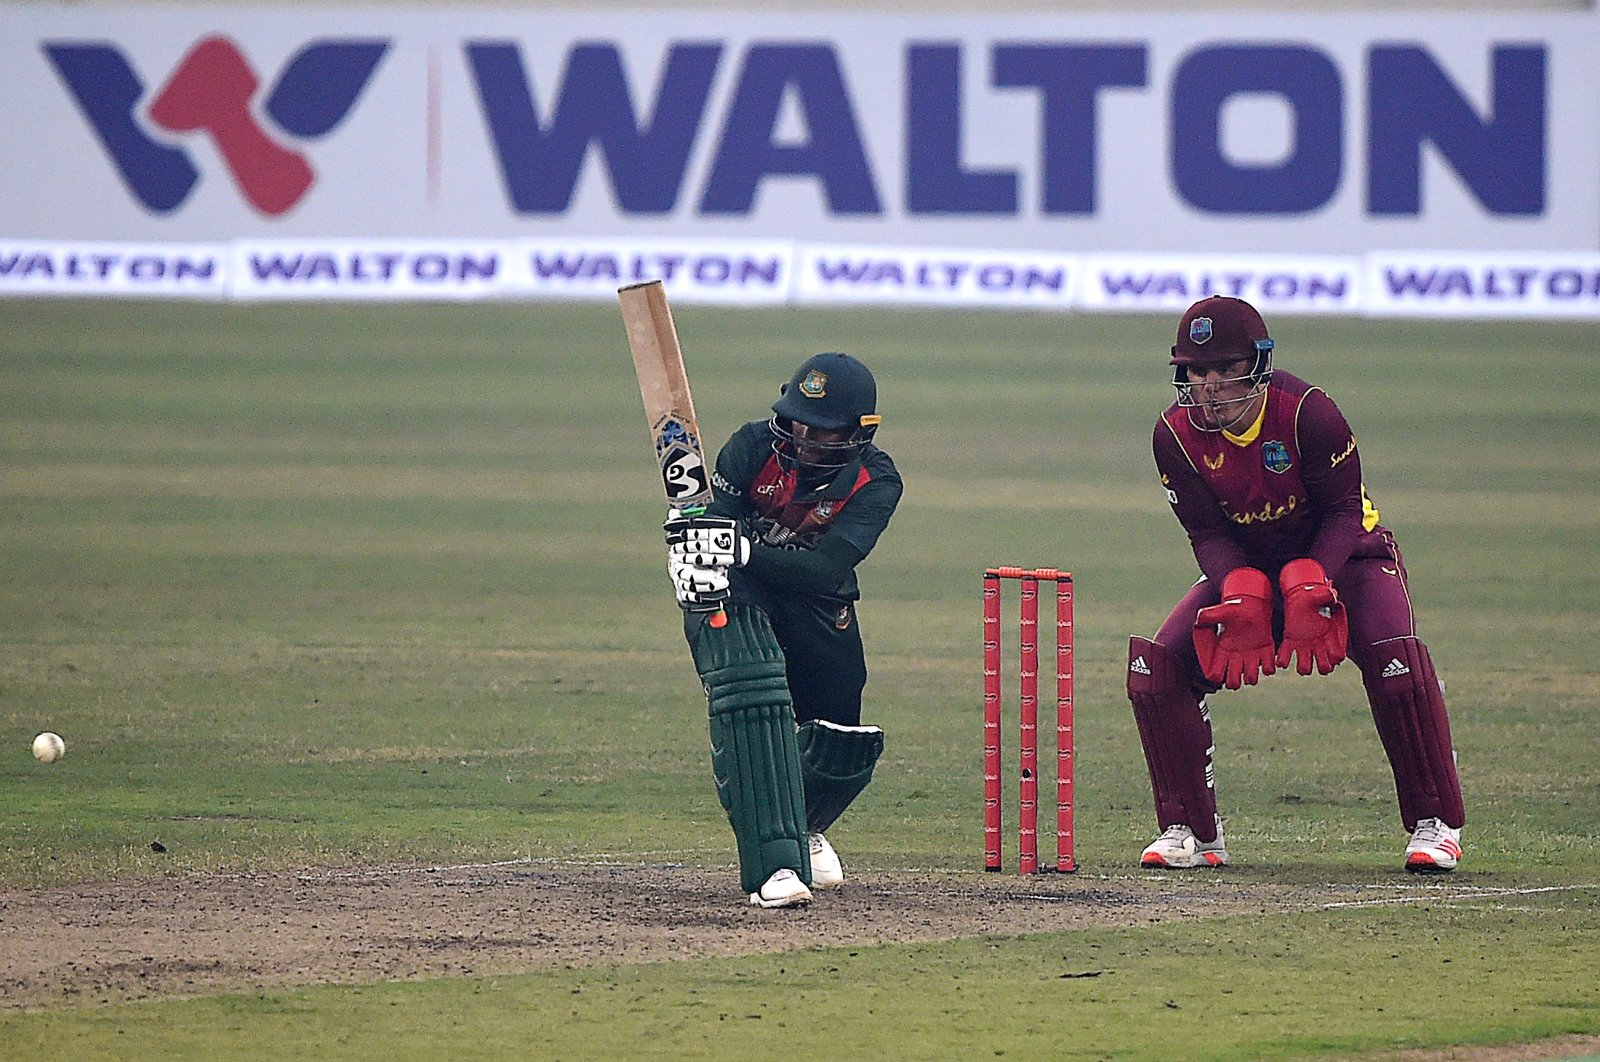 Bangladesh's Shakib Al Hasan (L) bats in the first one-day international (ODI) cricket match between Bangladesh and West Indies at the Sher-e-Bangla National Cricket Stadium, Dhaka, Jan. 20, 2021. (AFP Photo)